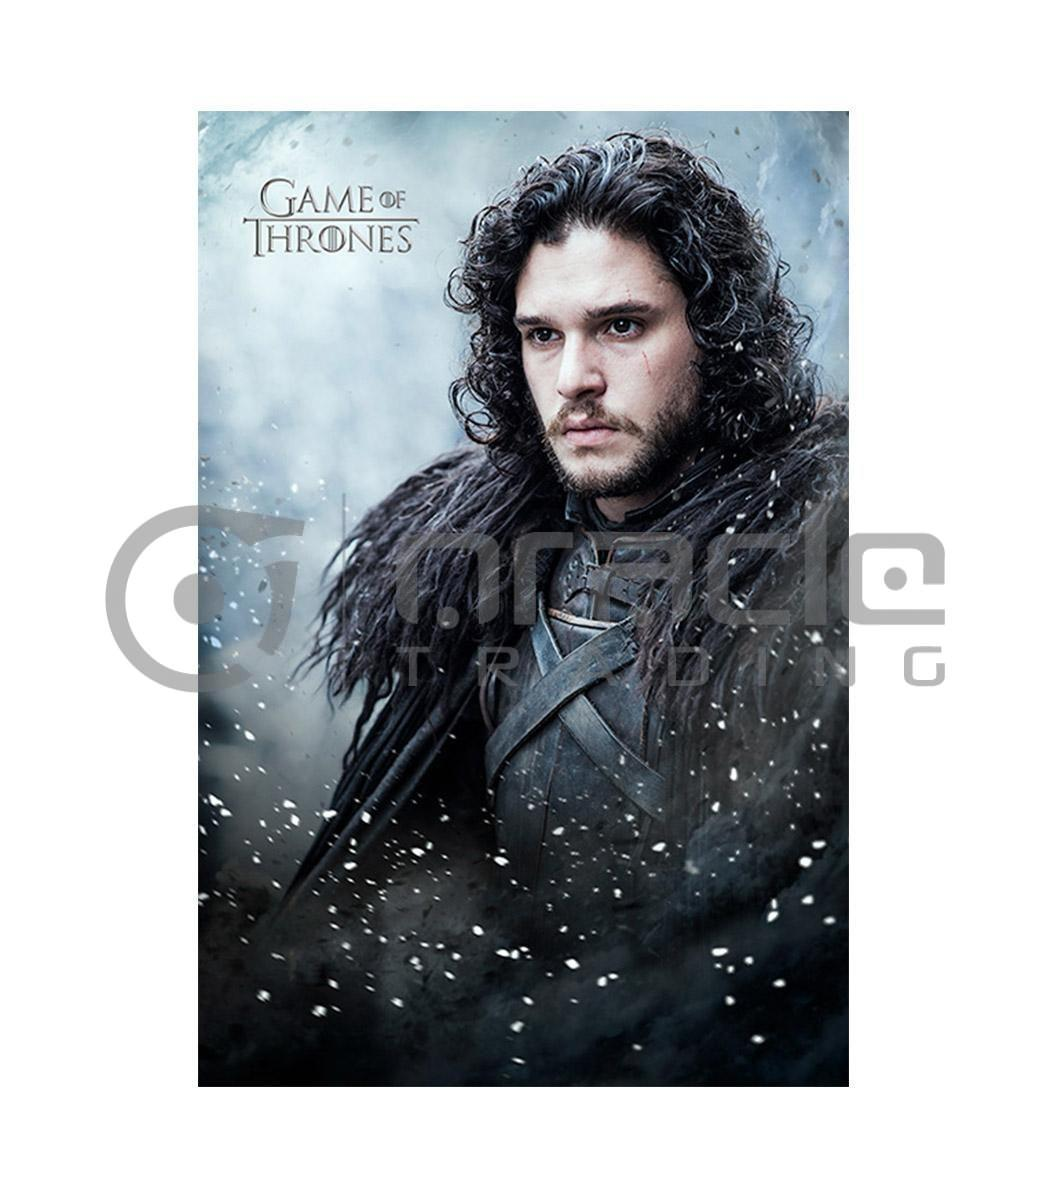 Game of Thrones Jon Snow Poster